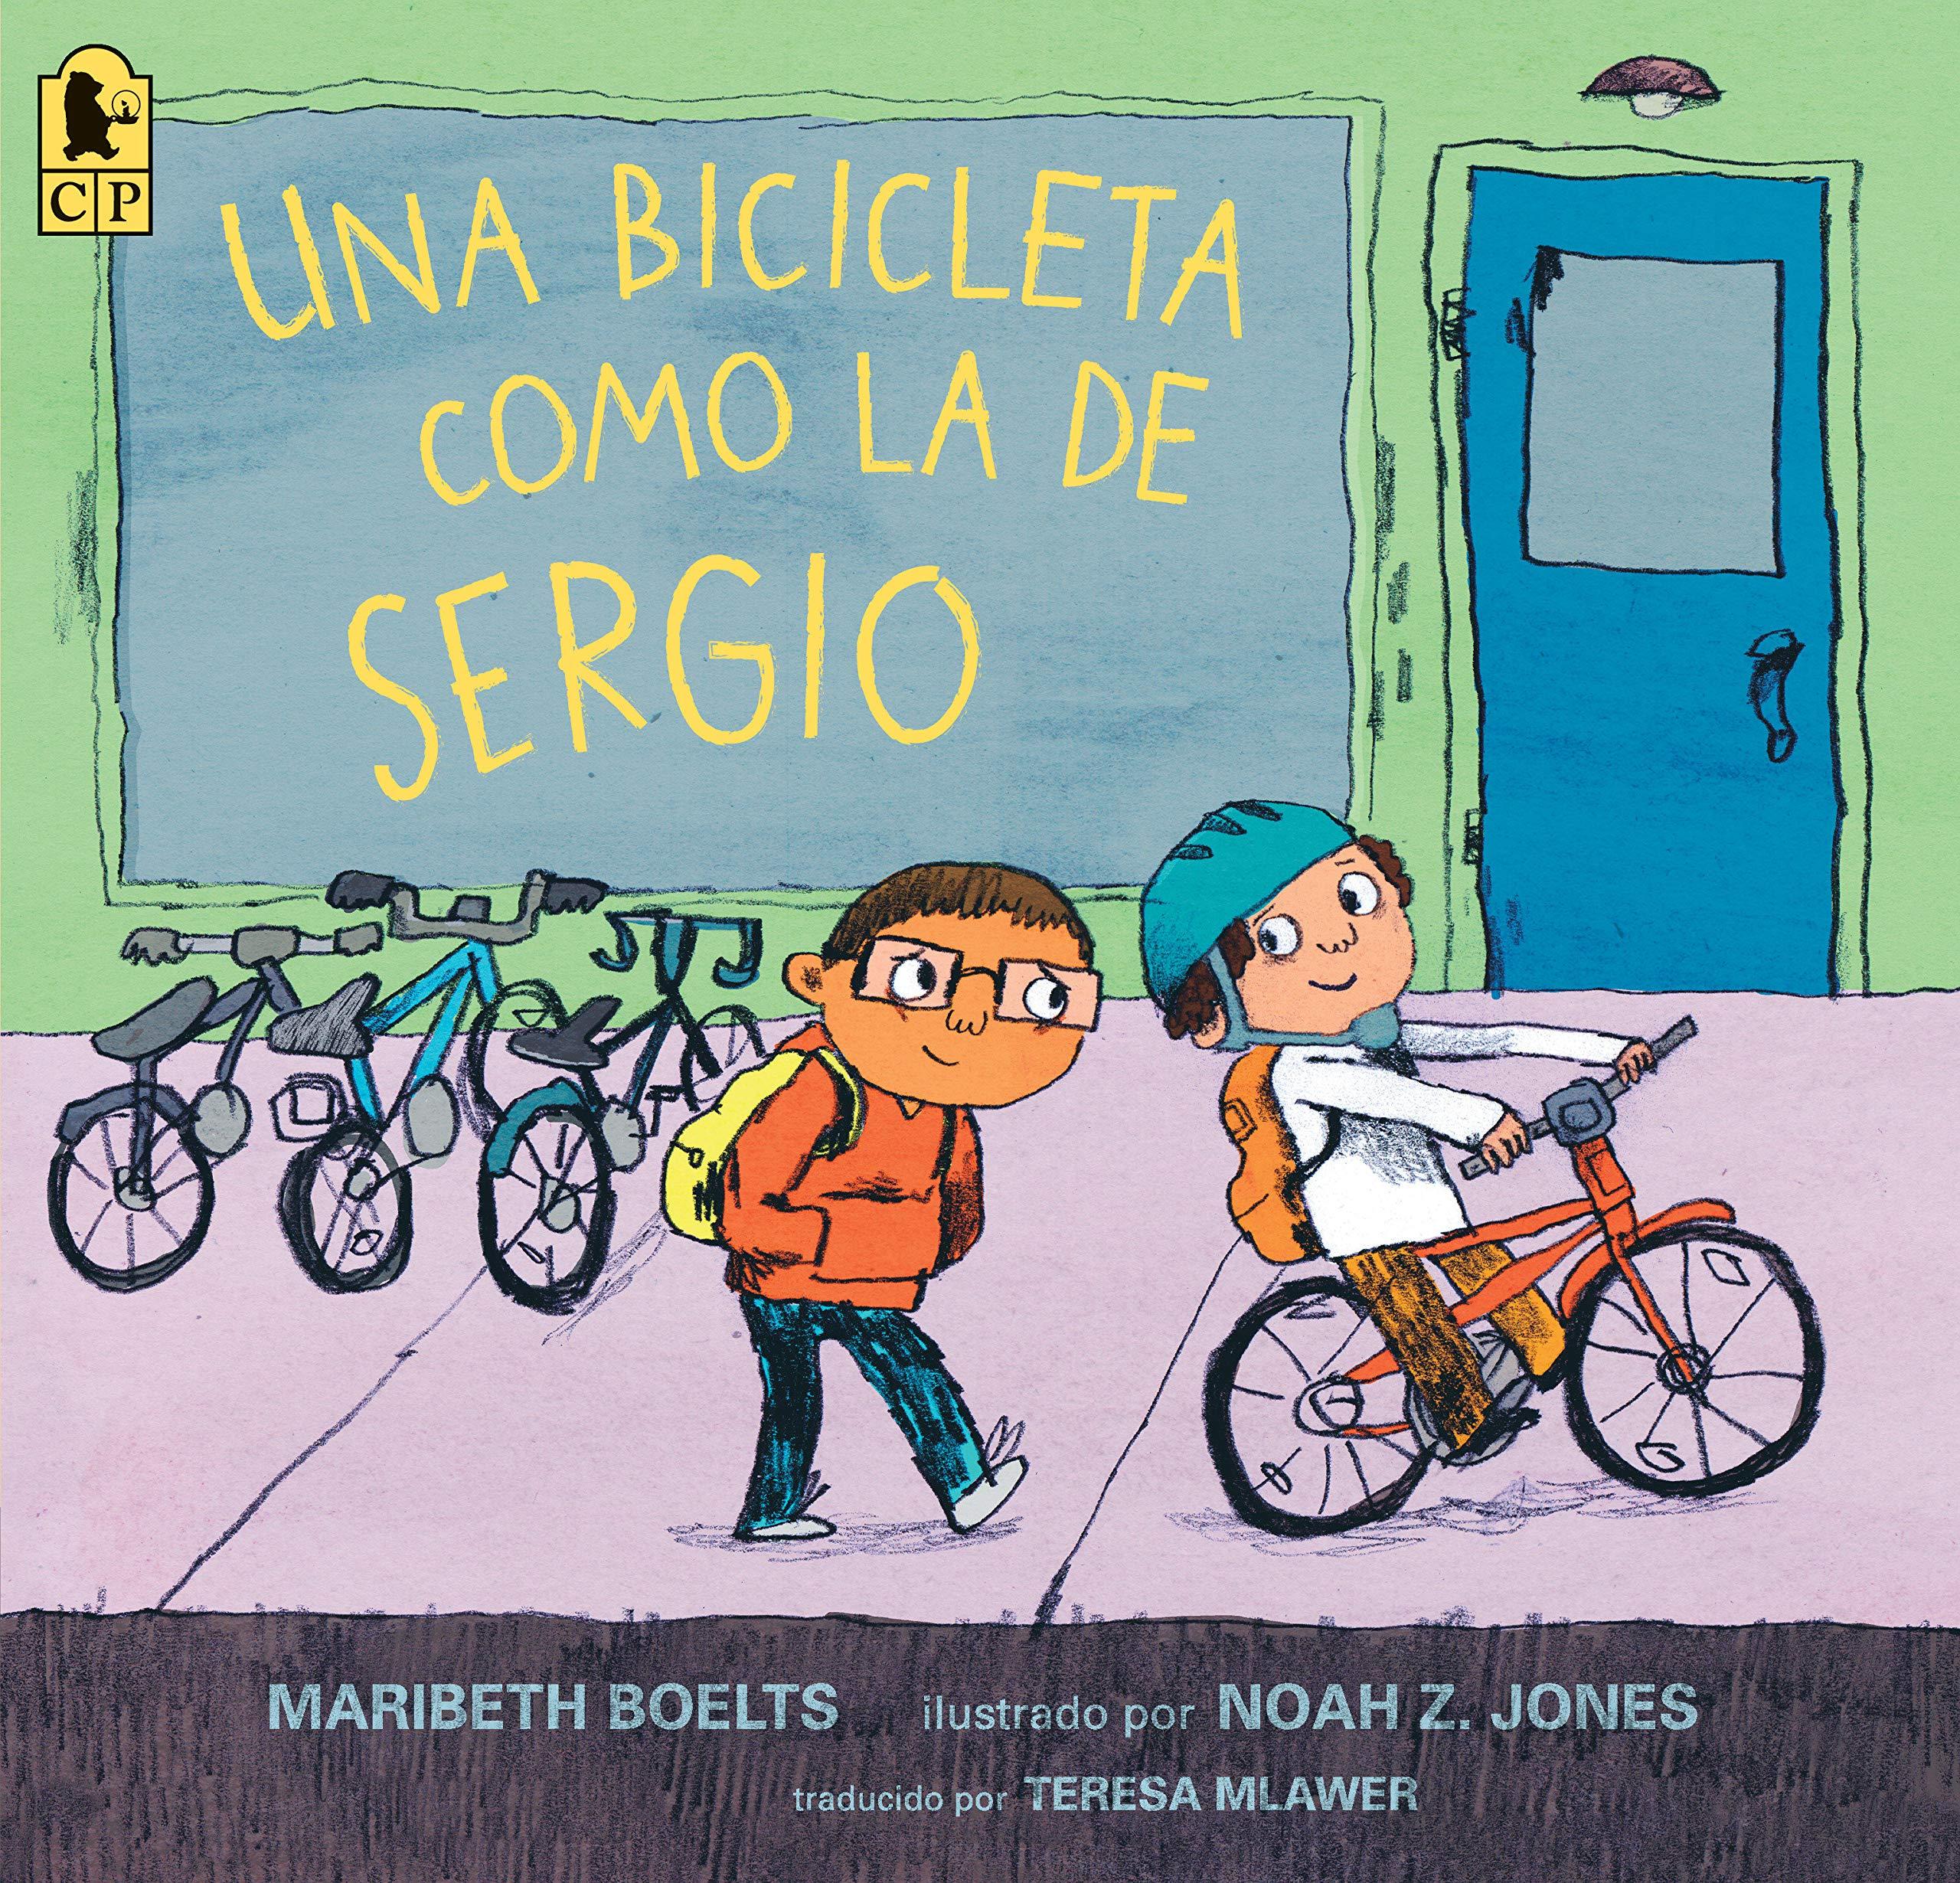 Una bicicleta como la de Sergio (Spanish Edition) (Spanish) Paperback – April 9, 2019